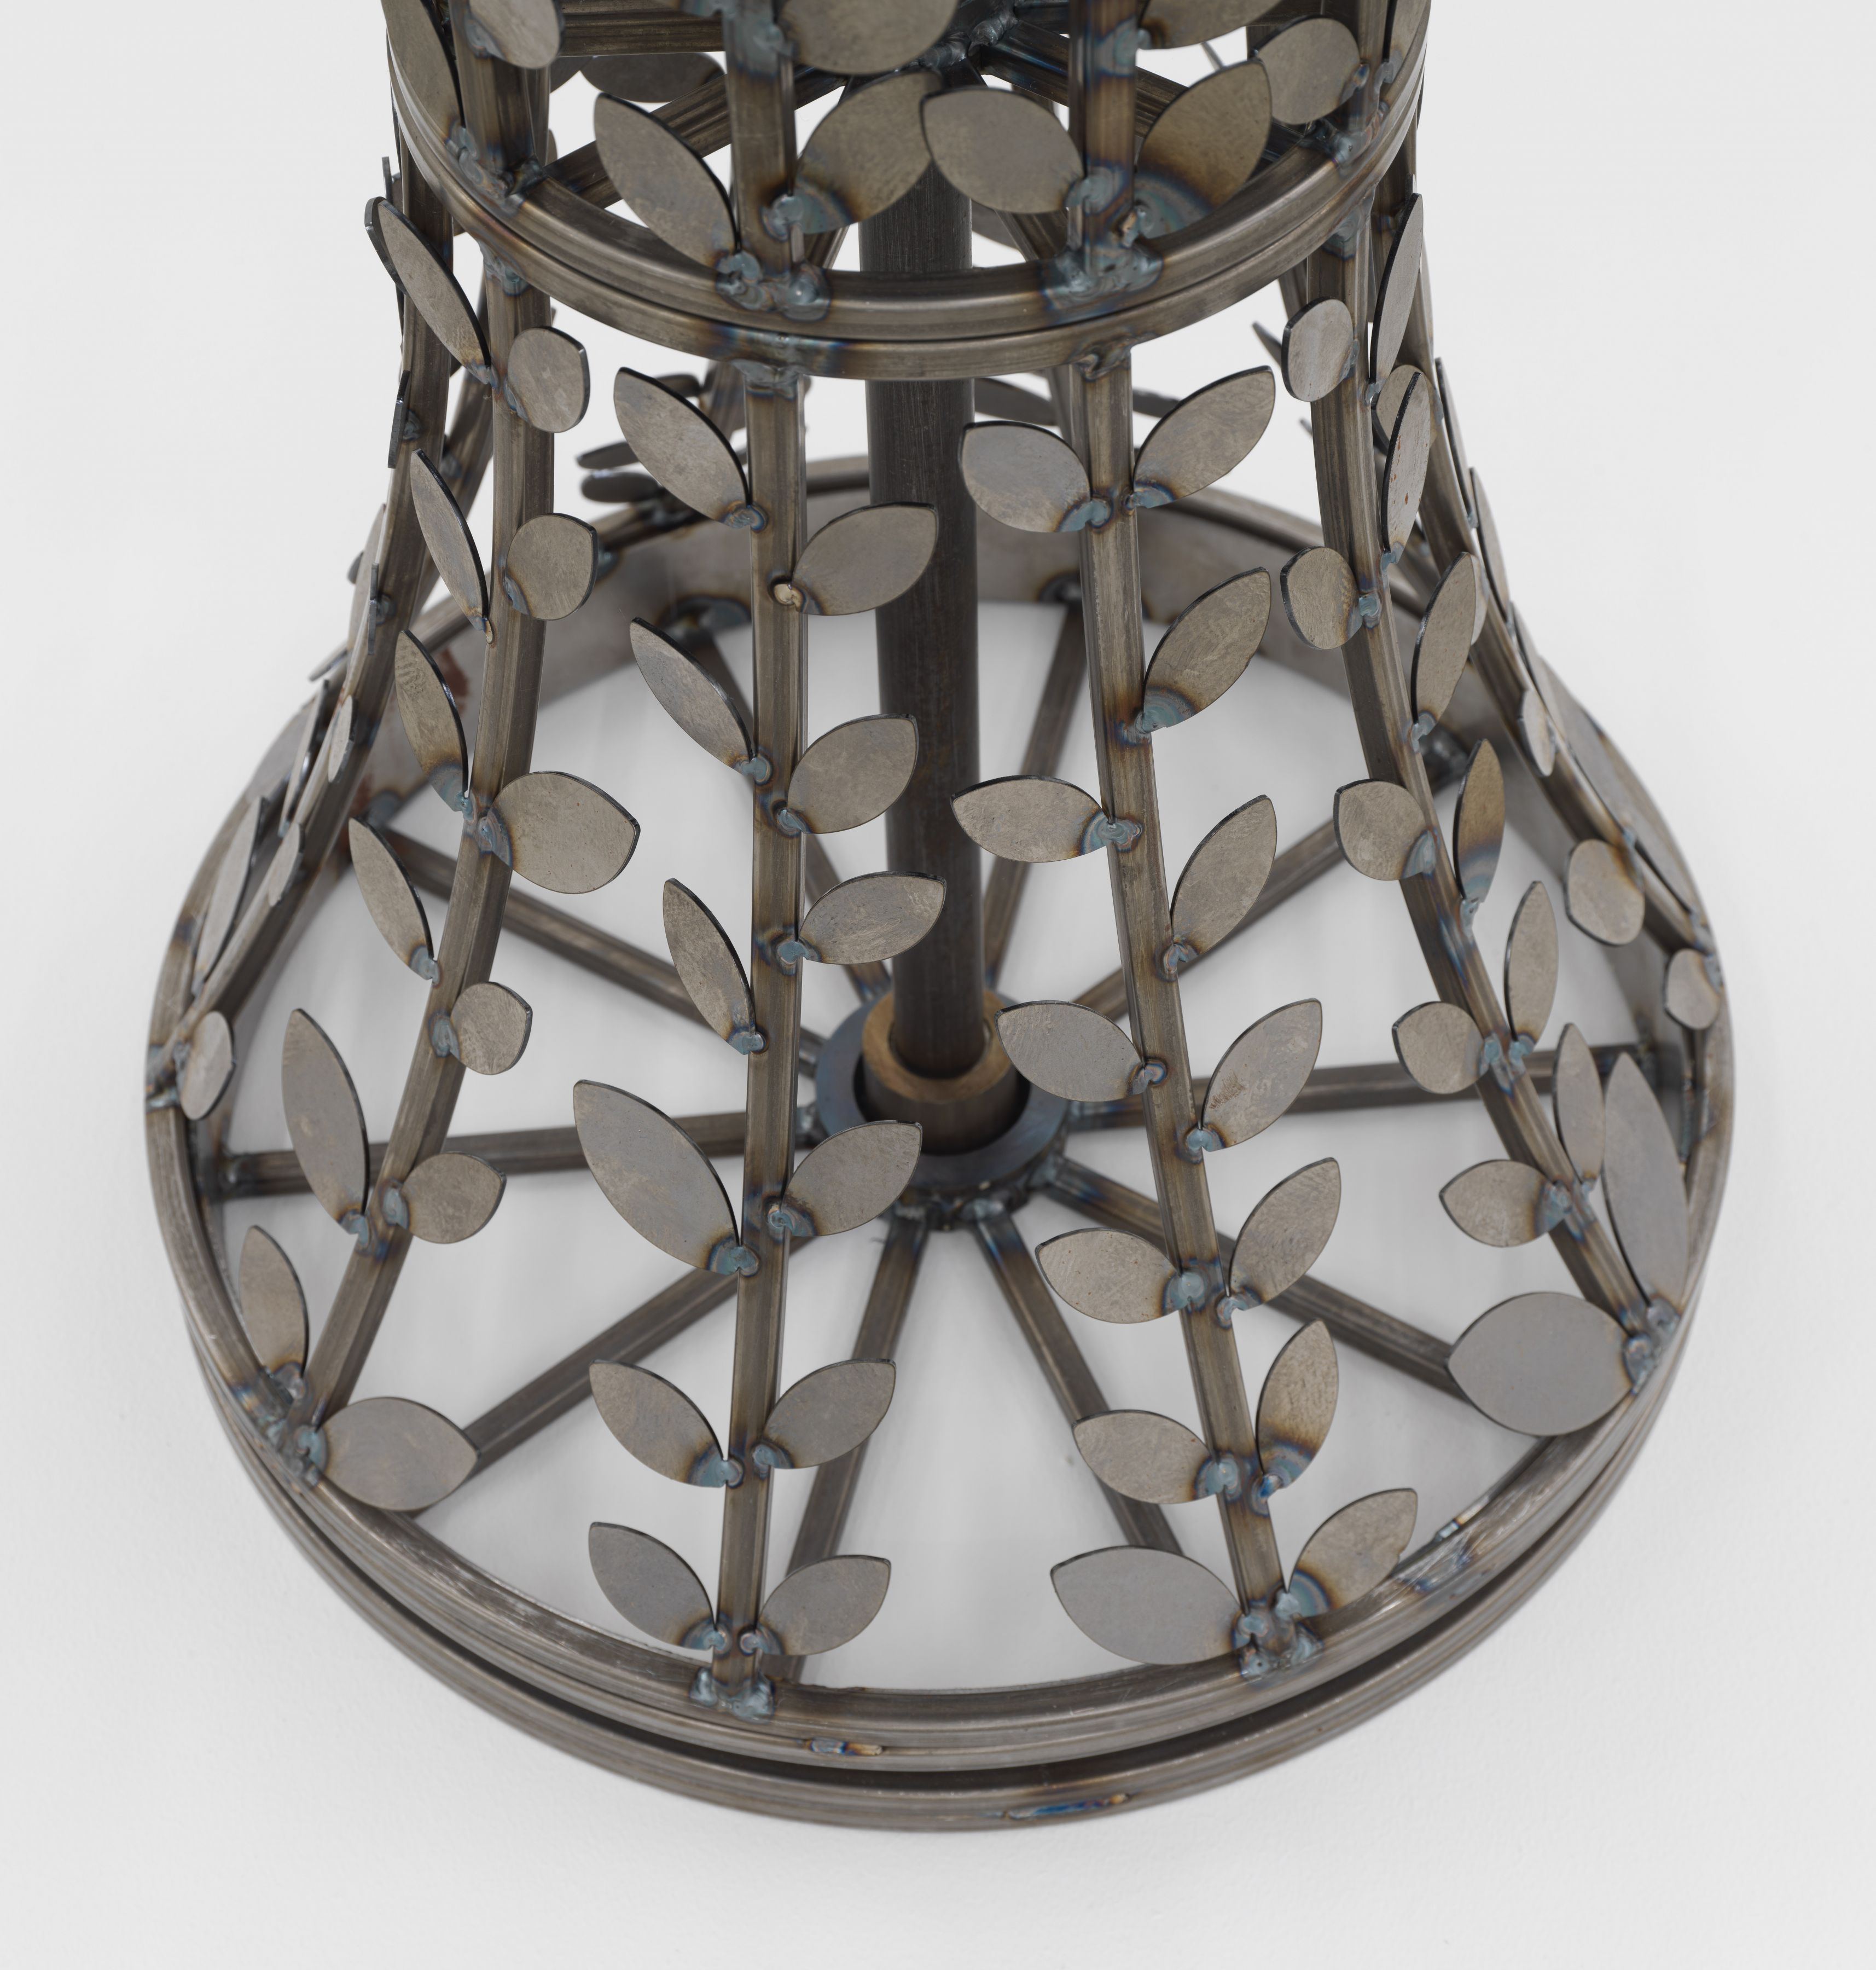 Serie Máquinas Inútiles. Lámpara, 1974/2019, detail, Welded steel